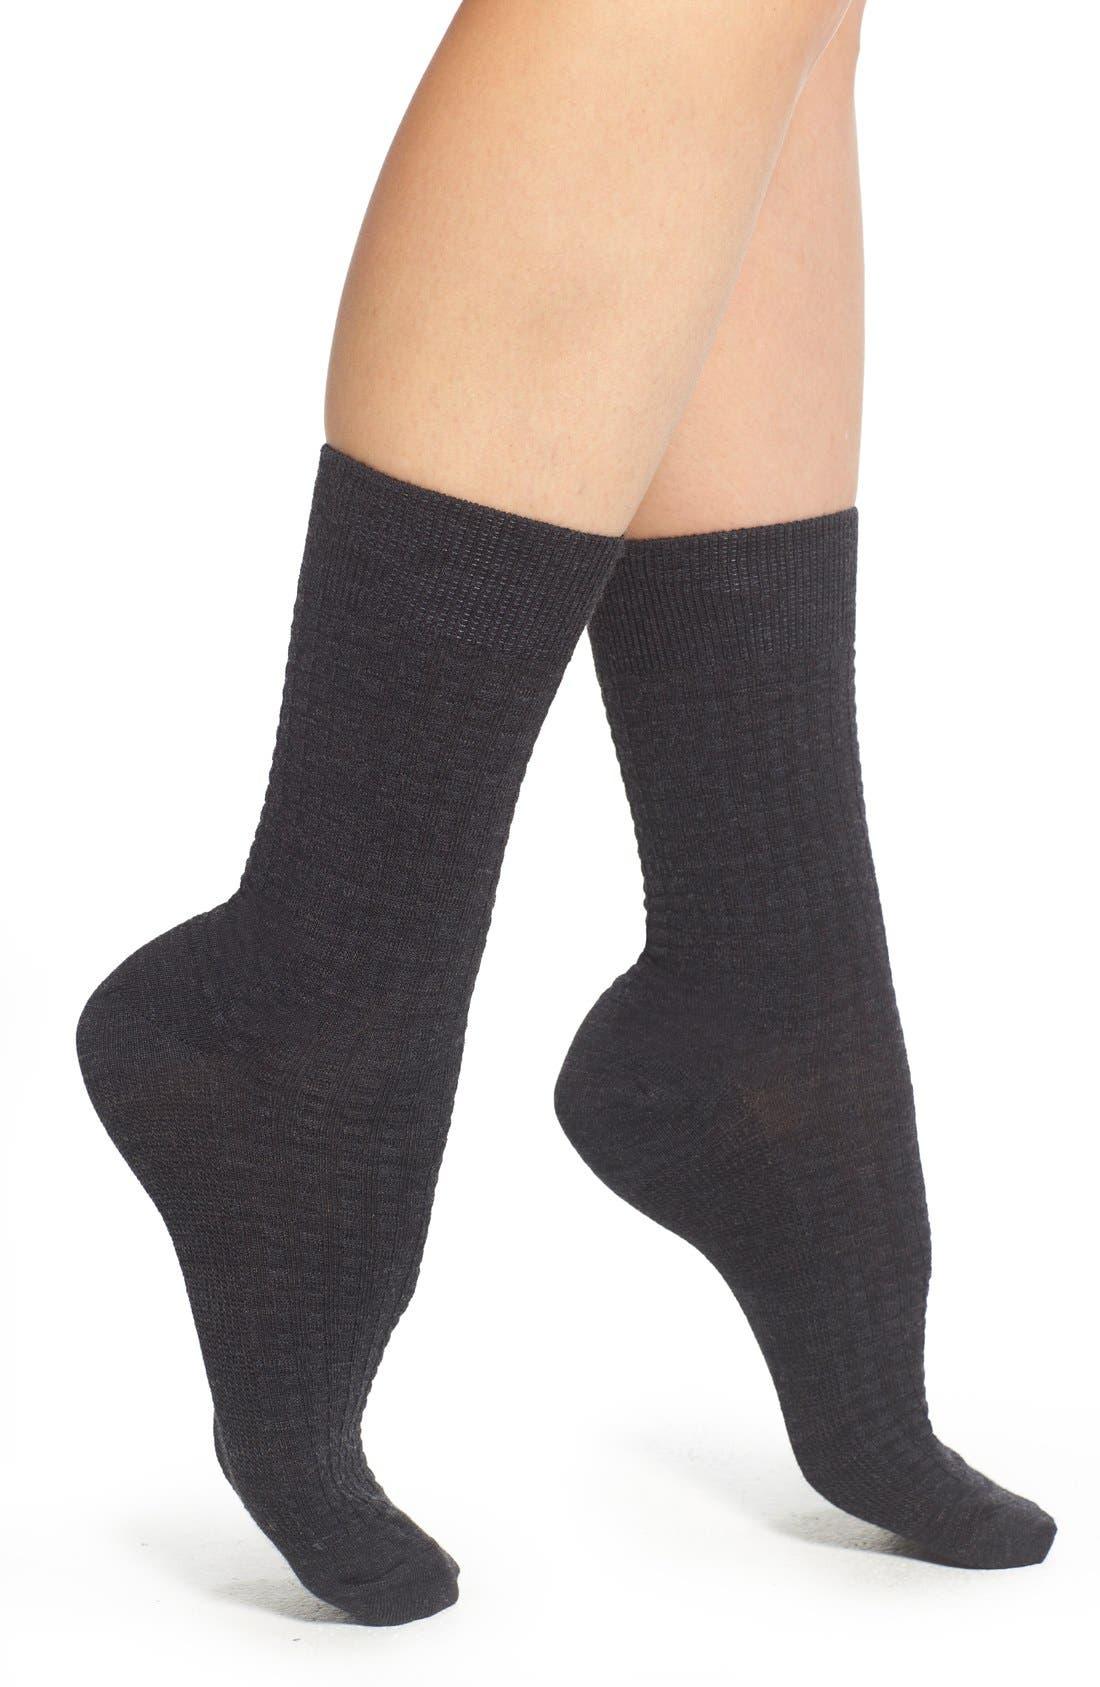 Alternate Image 1 Selected - Smartwool Textured Crew Socks